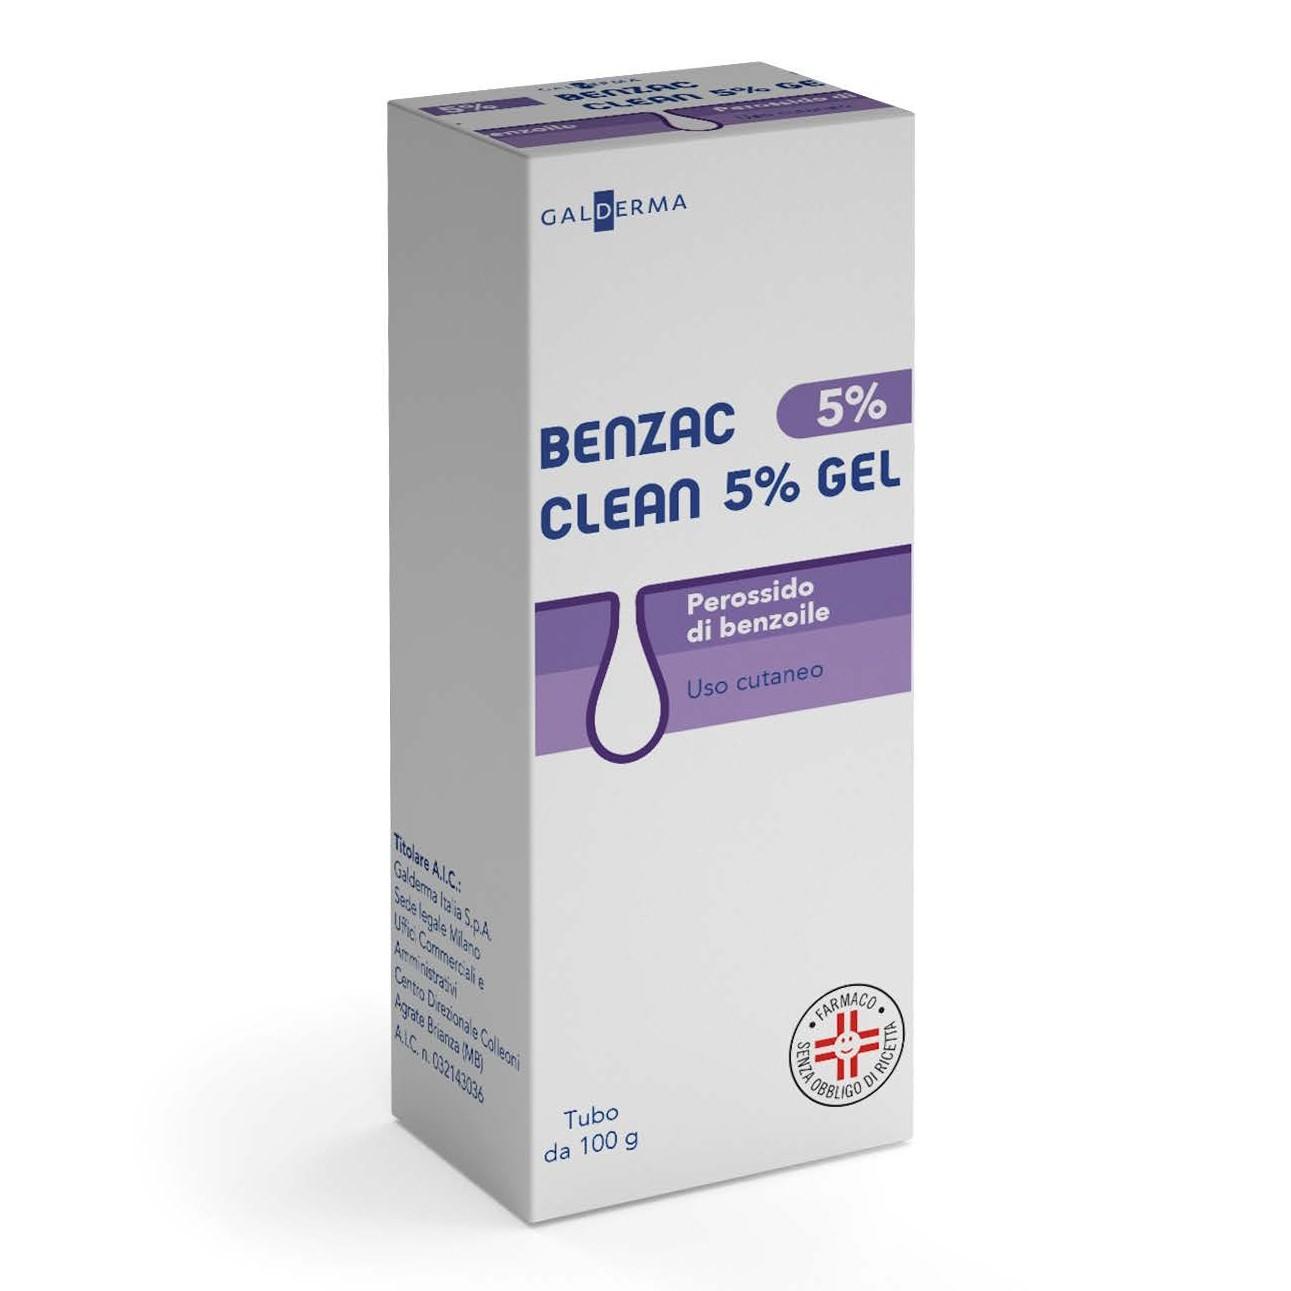 Benzac* Gel Clean 5% Tubo 100 g